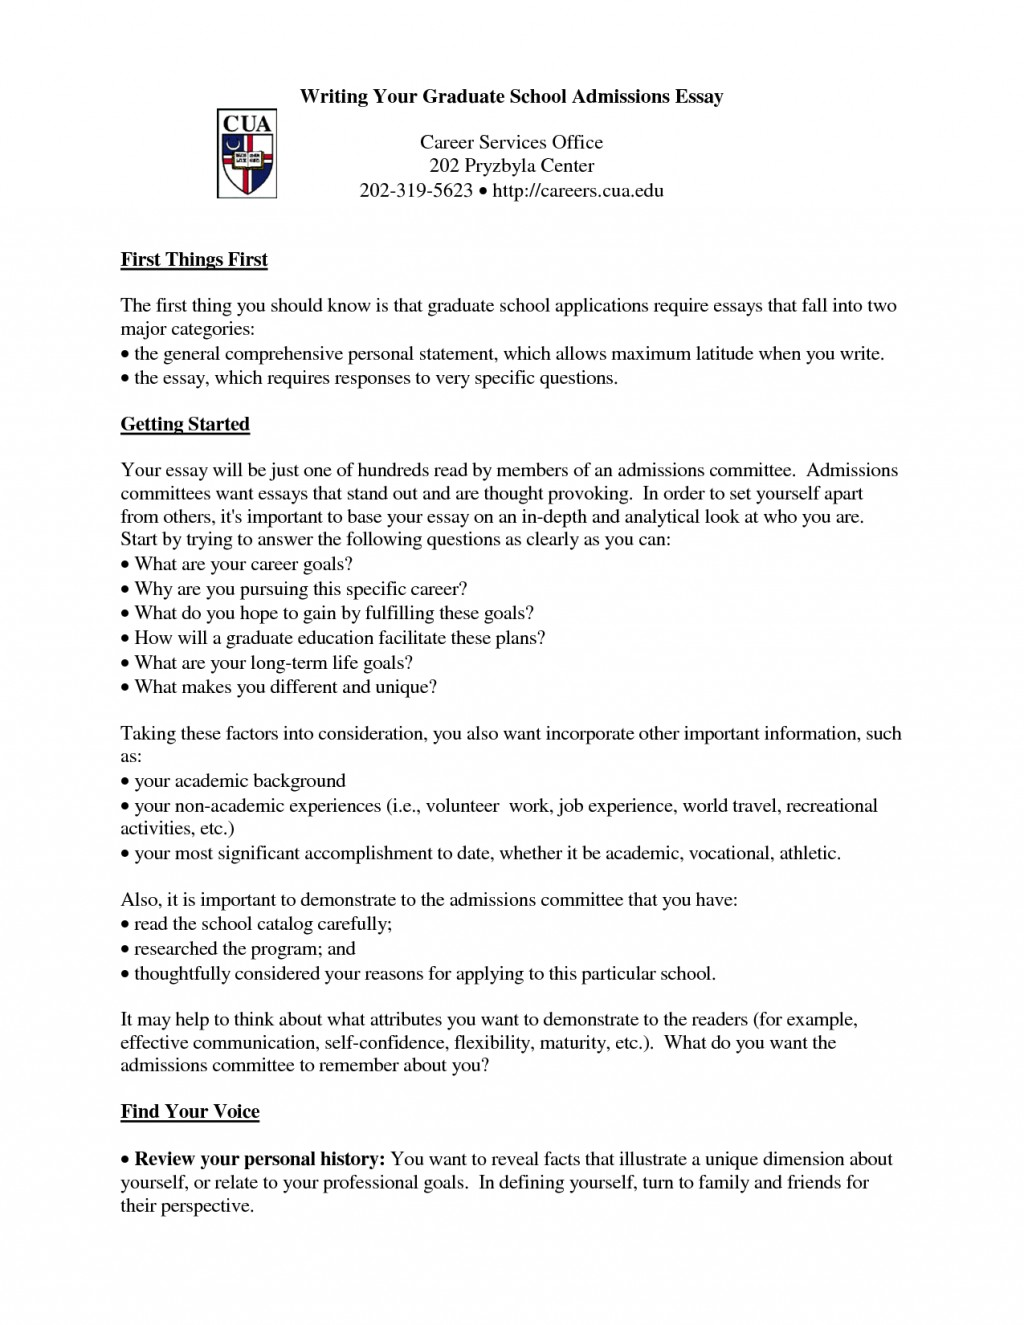 001 Graduate School Admission Essay Essaymedicalpersonalstatement615b0bd1 Frightening Examples Social Work Nursing Samples Large